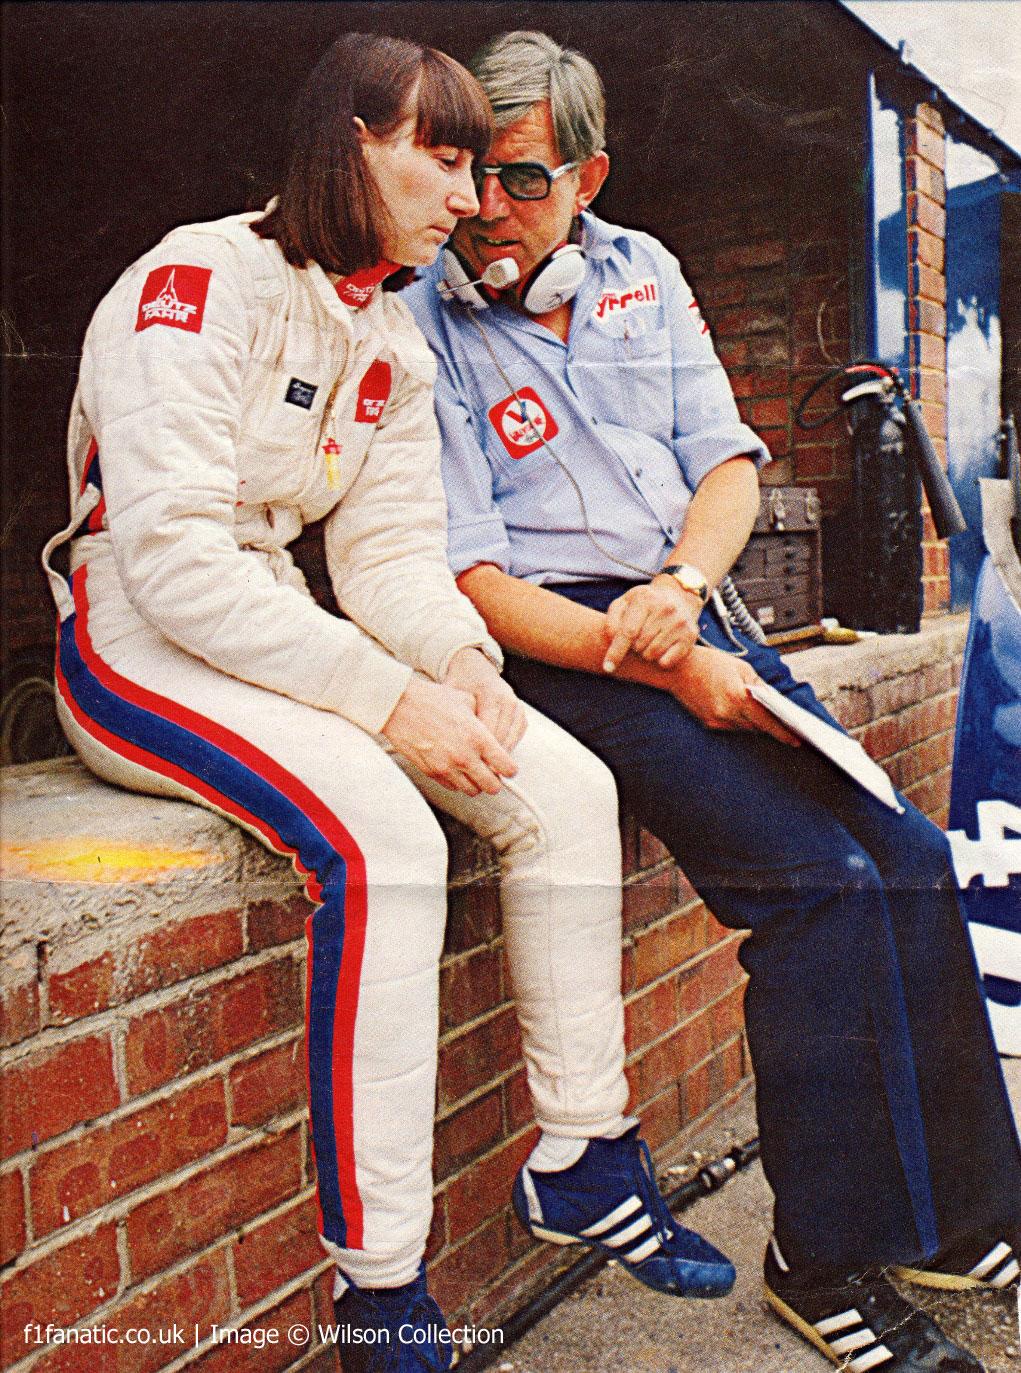 Desire Wilson, Ken Tyrrell, Kyalami, 1981